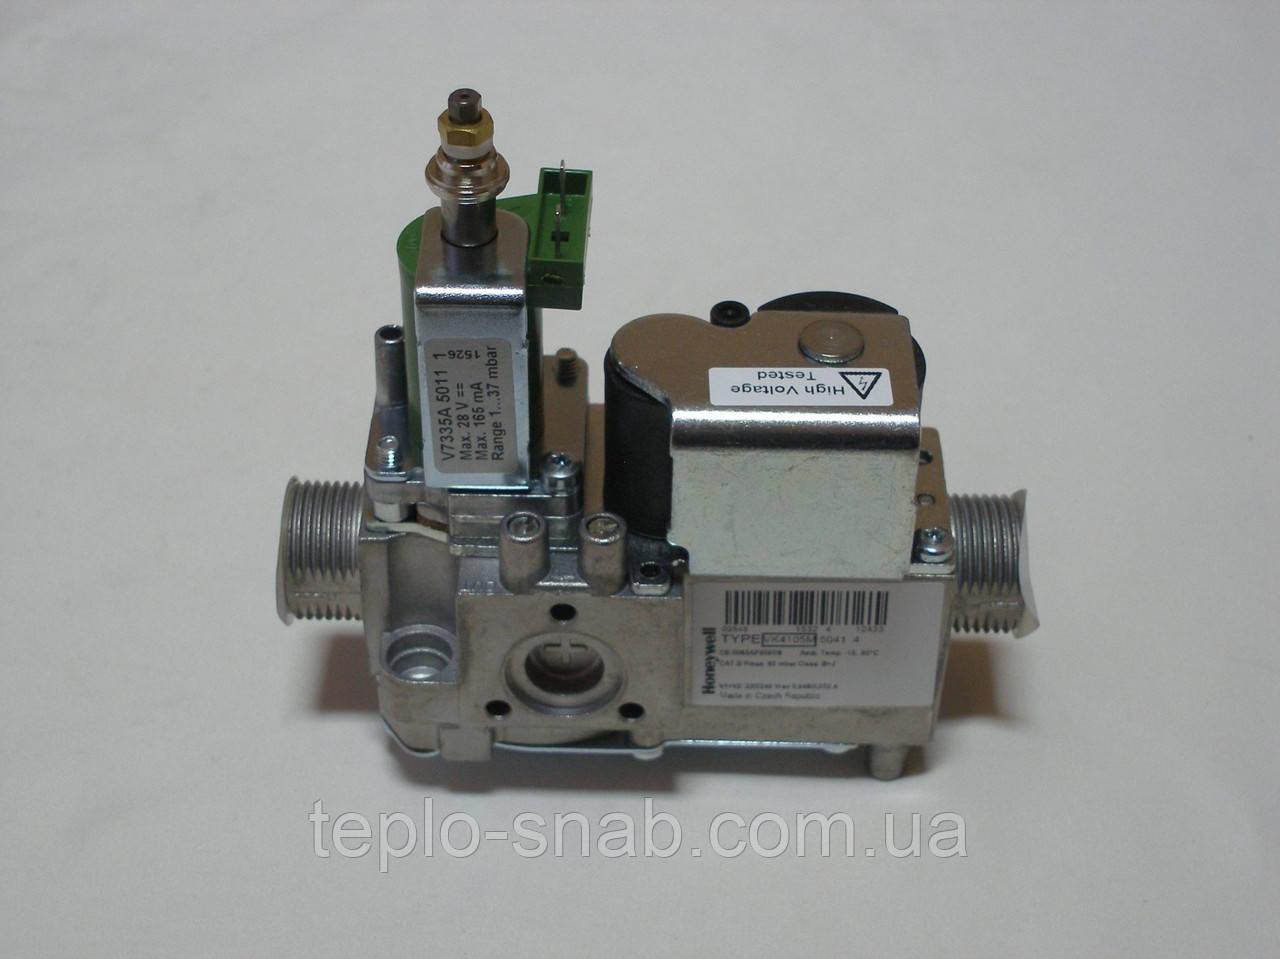 Газовый клапан Honeywell VK4105M5041U. Chaffoteaux 61312123. Ariston 65100244